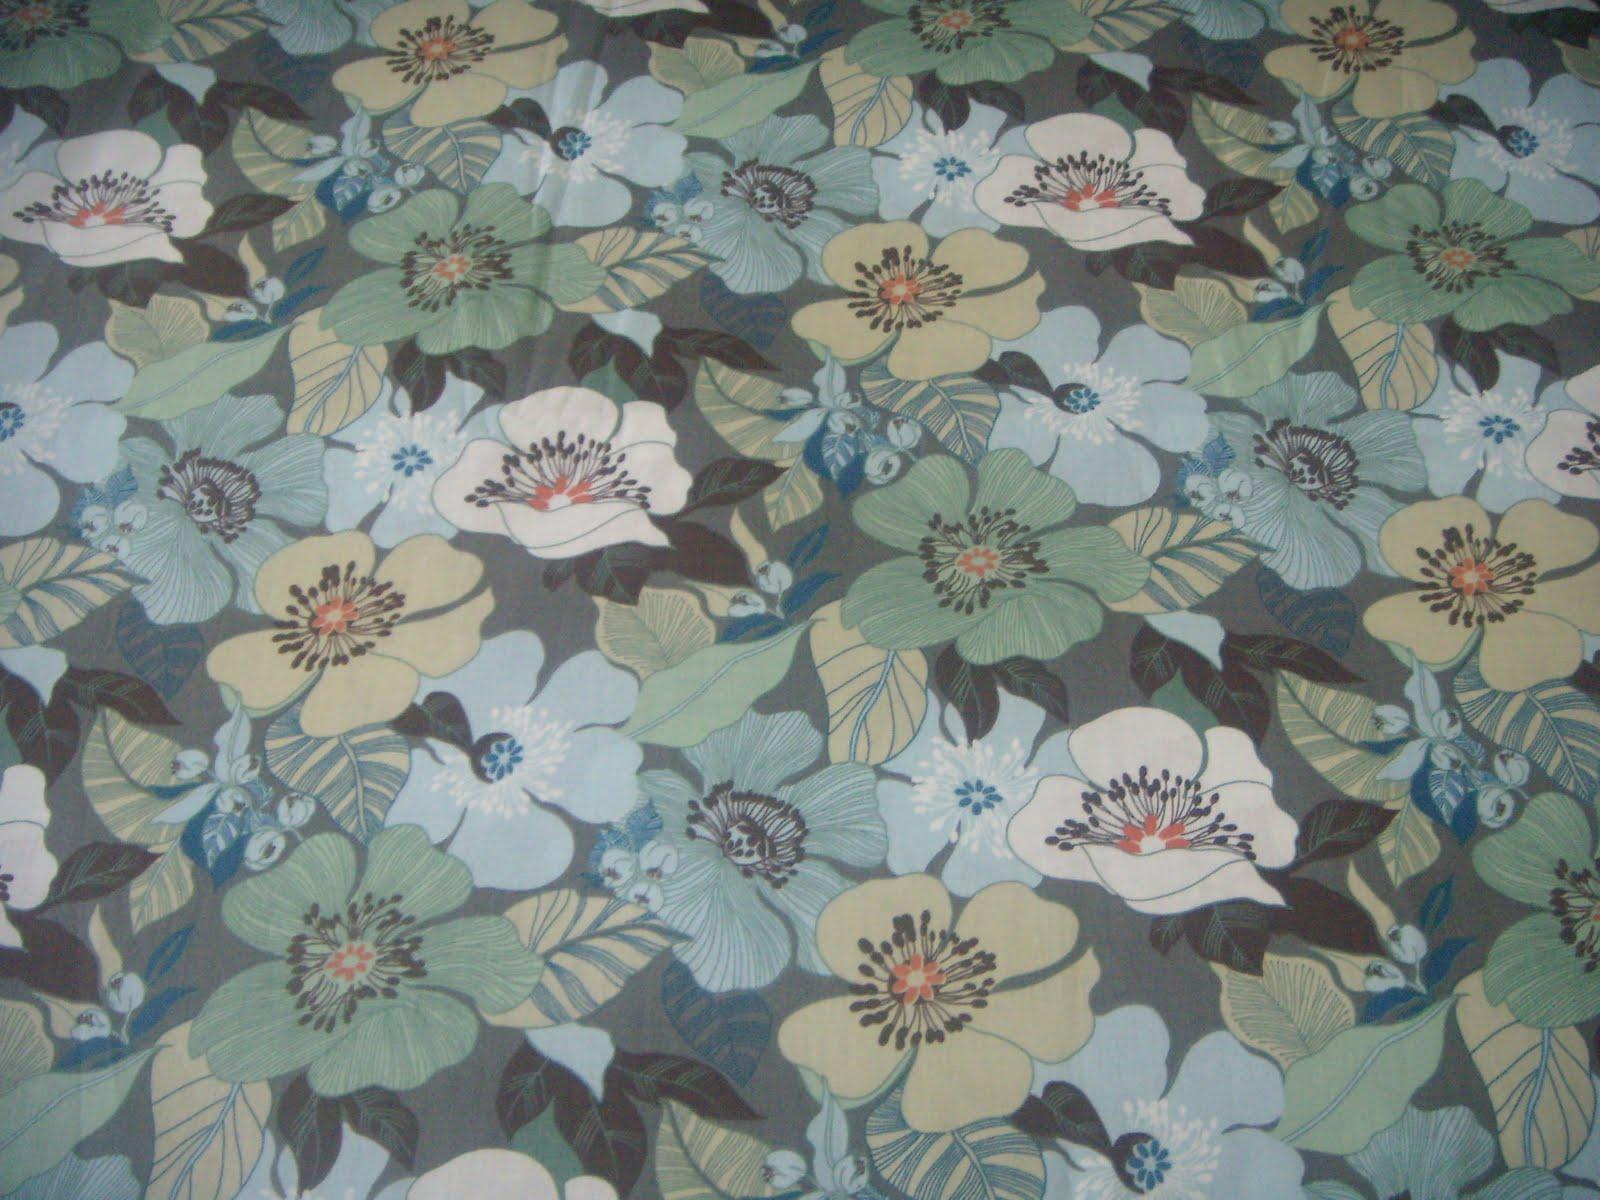 Cotton Jepun Blogspot Kain Cotton Cotton Jepun